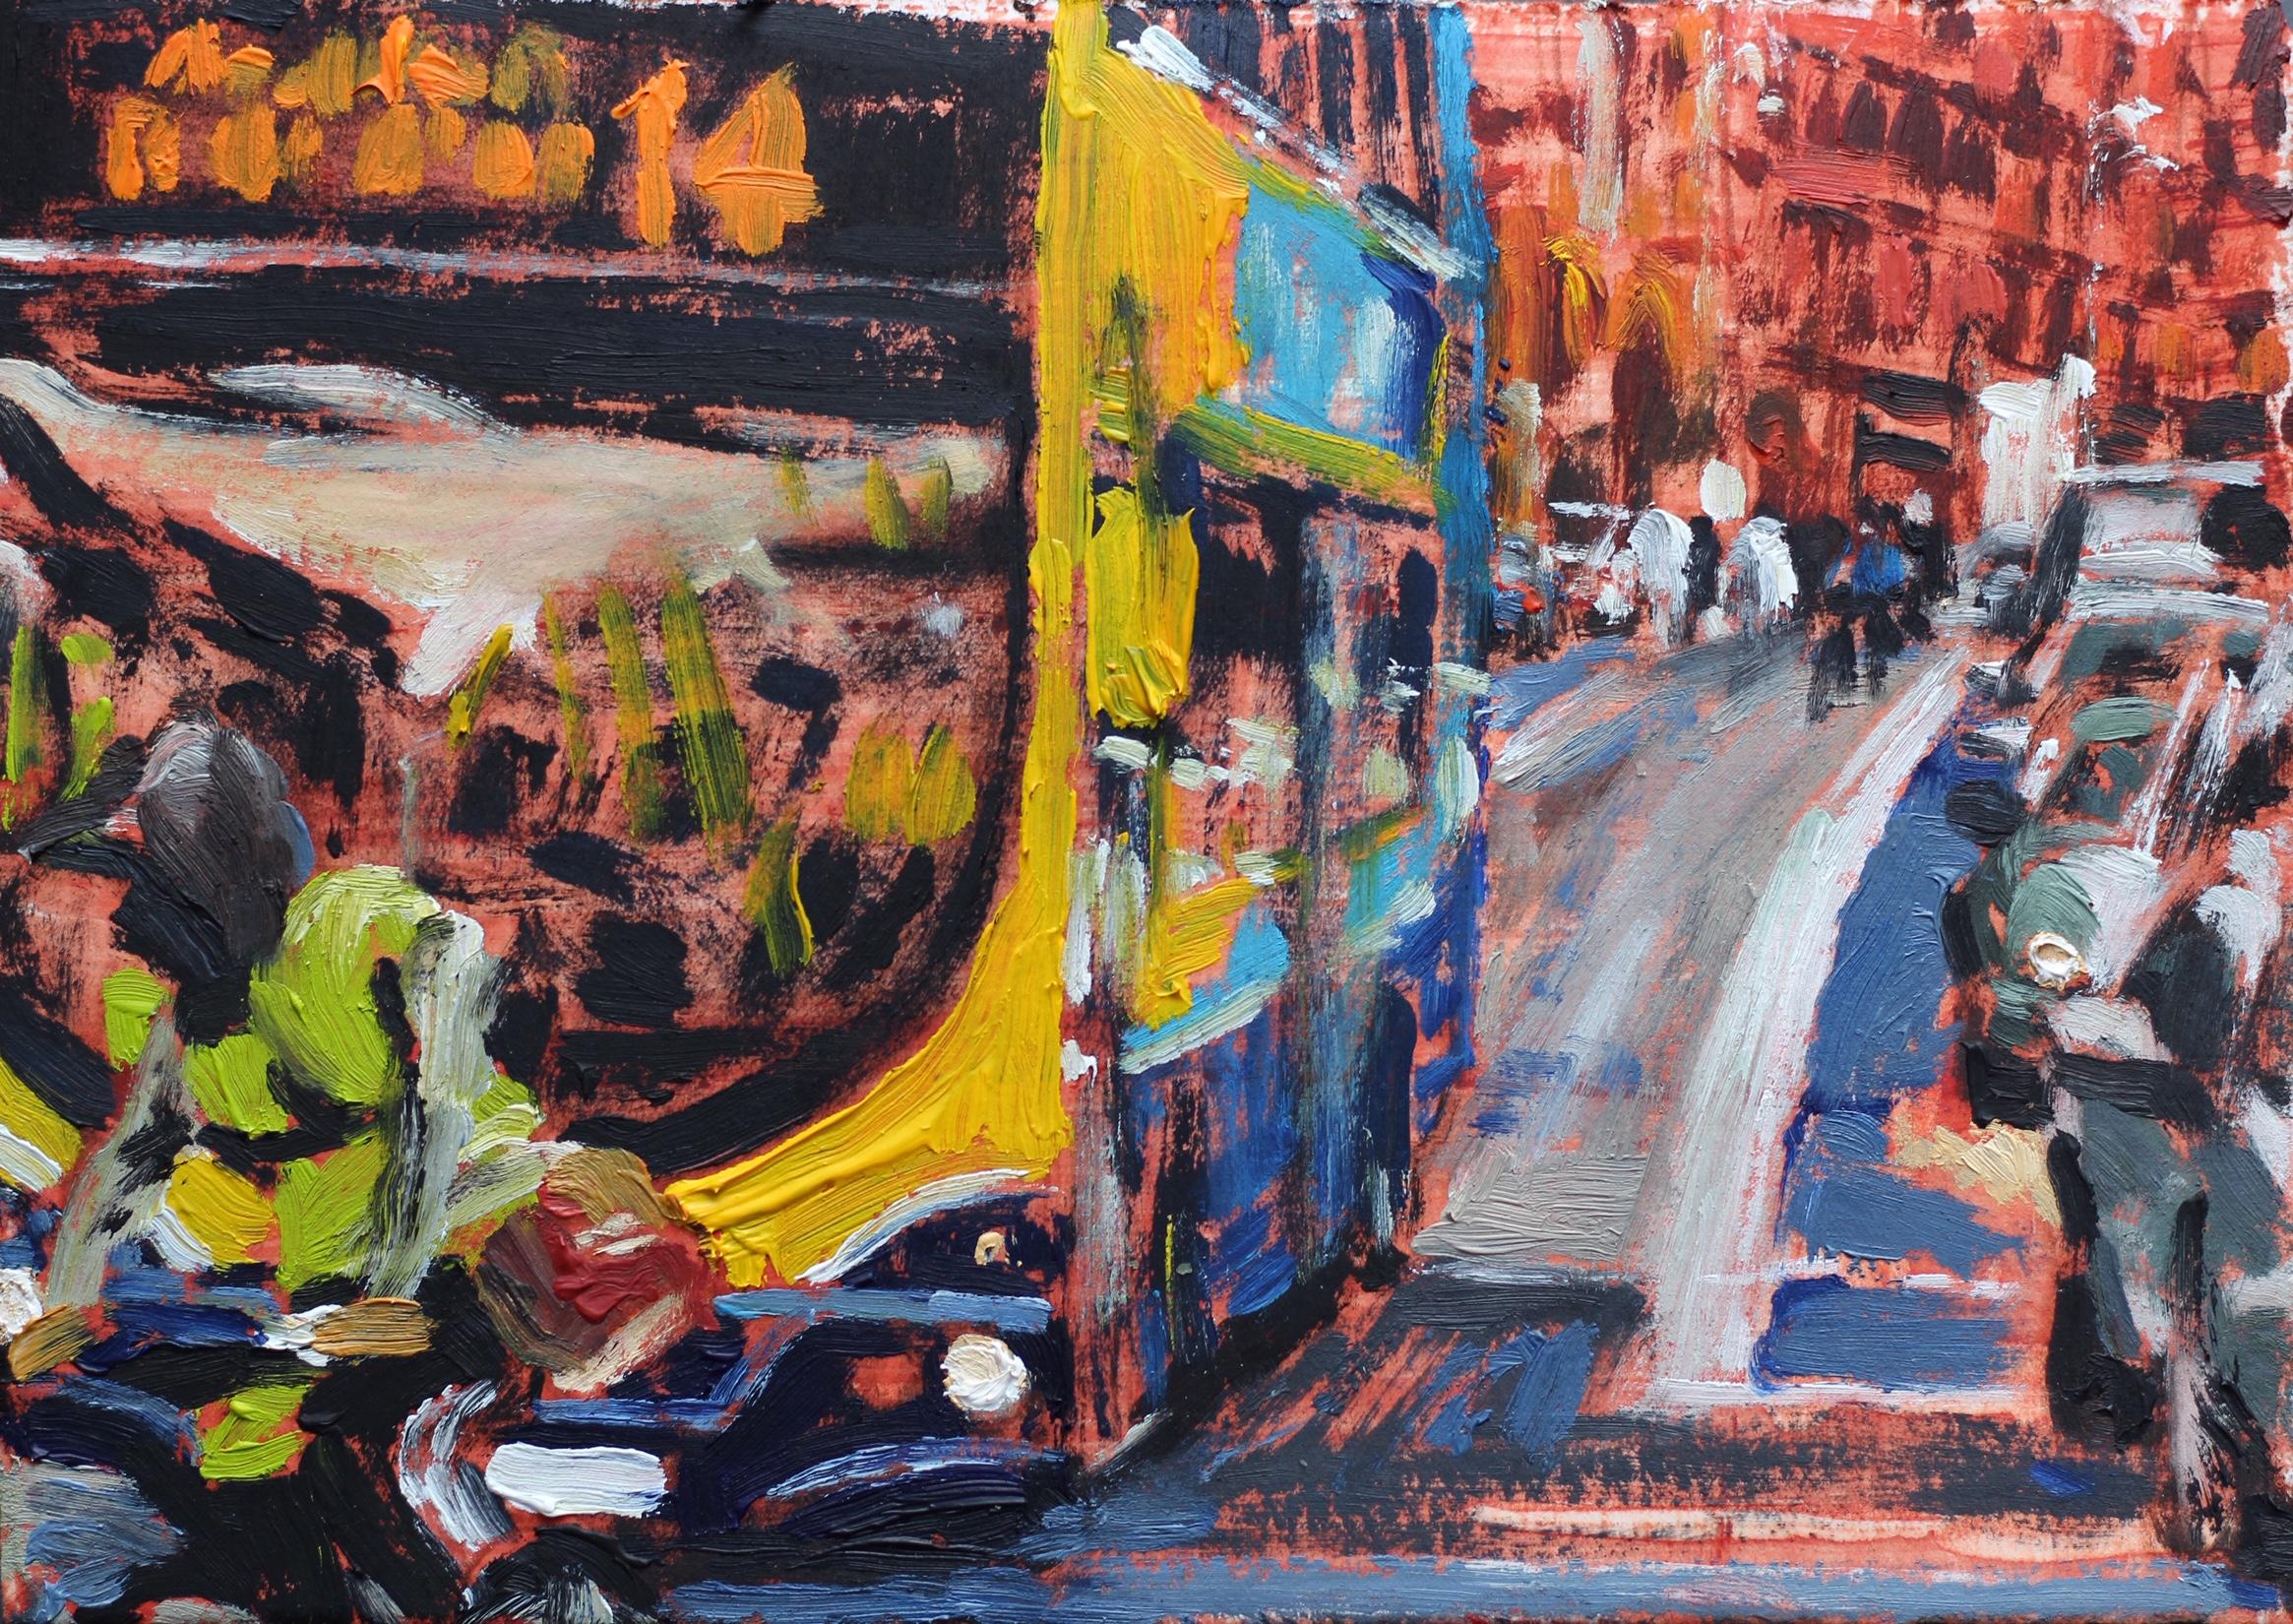 The Rush on George's Street 1 - 15x20cm